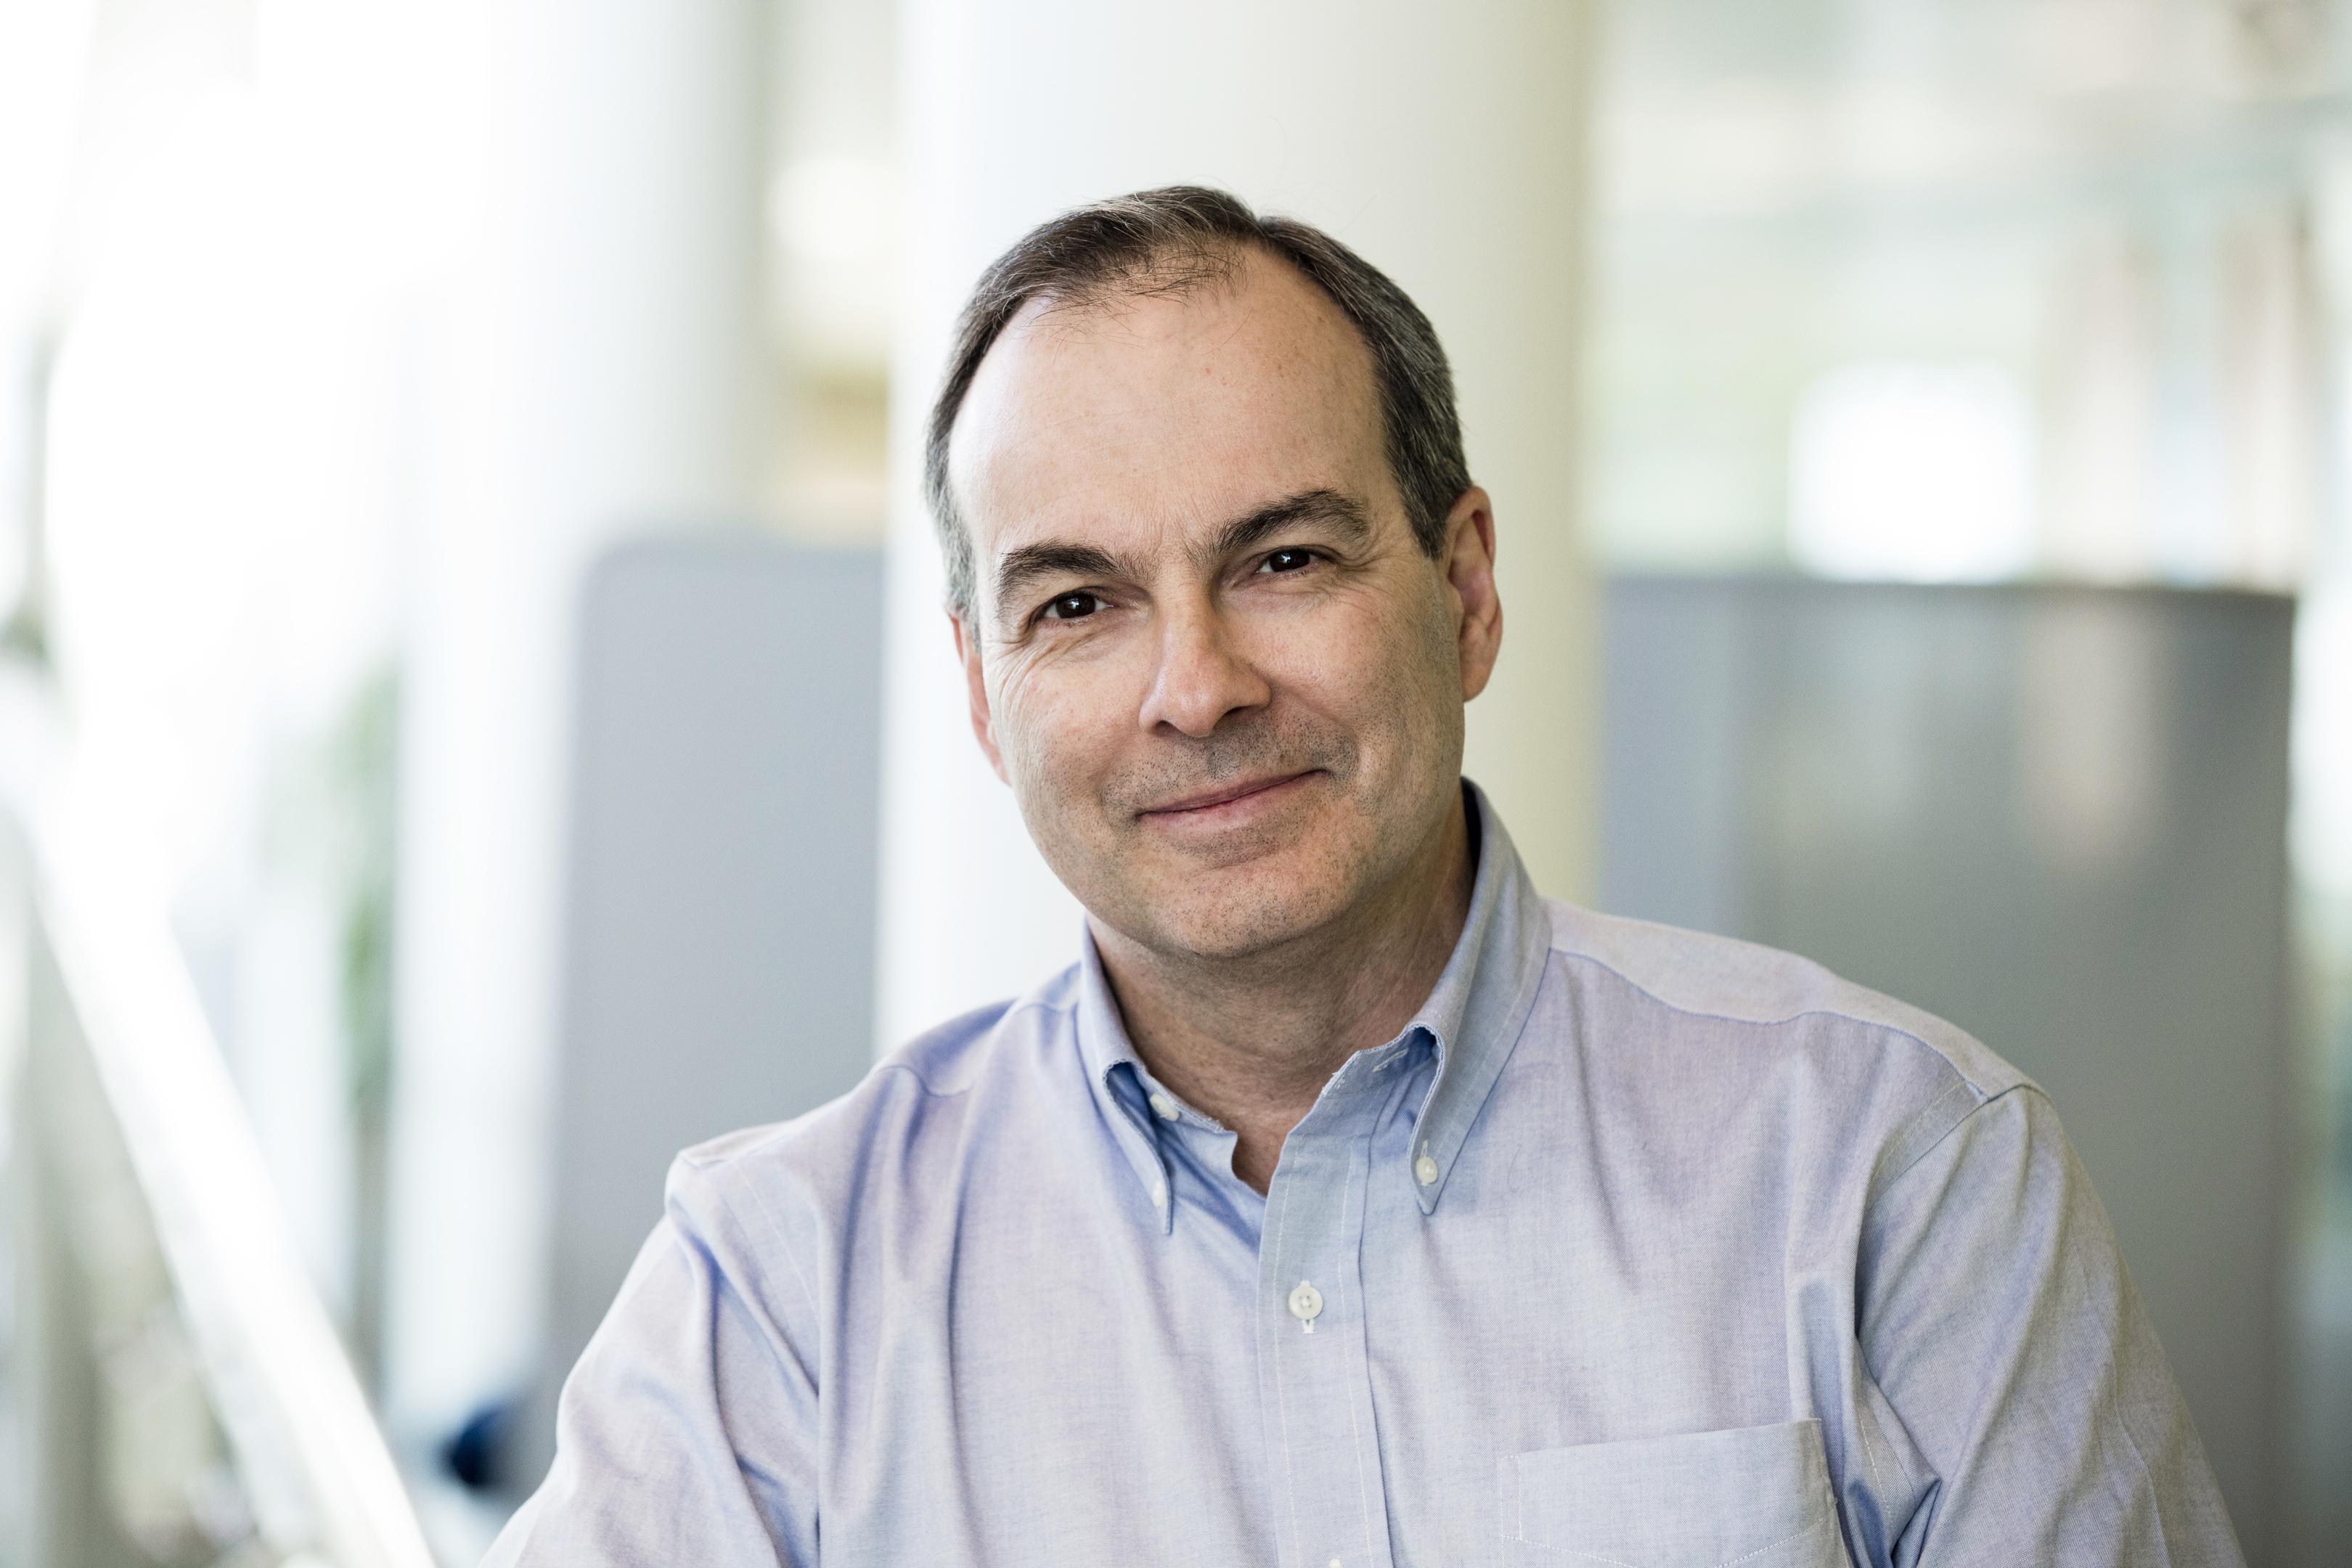 BP's North Sea regional president Mark Thomas